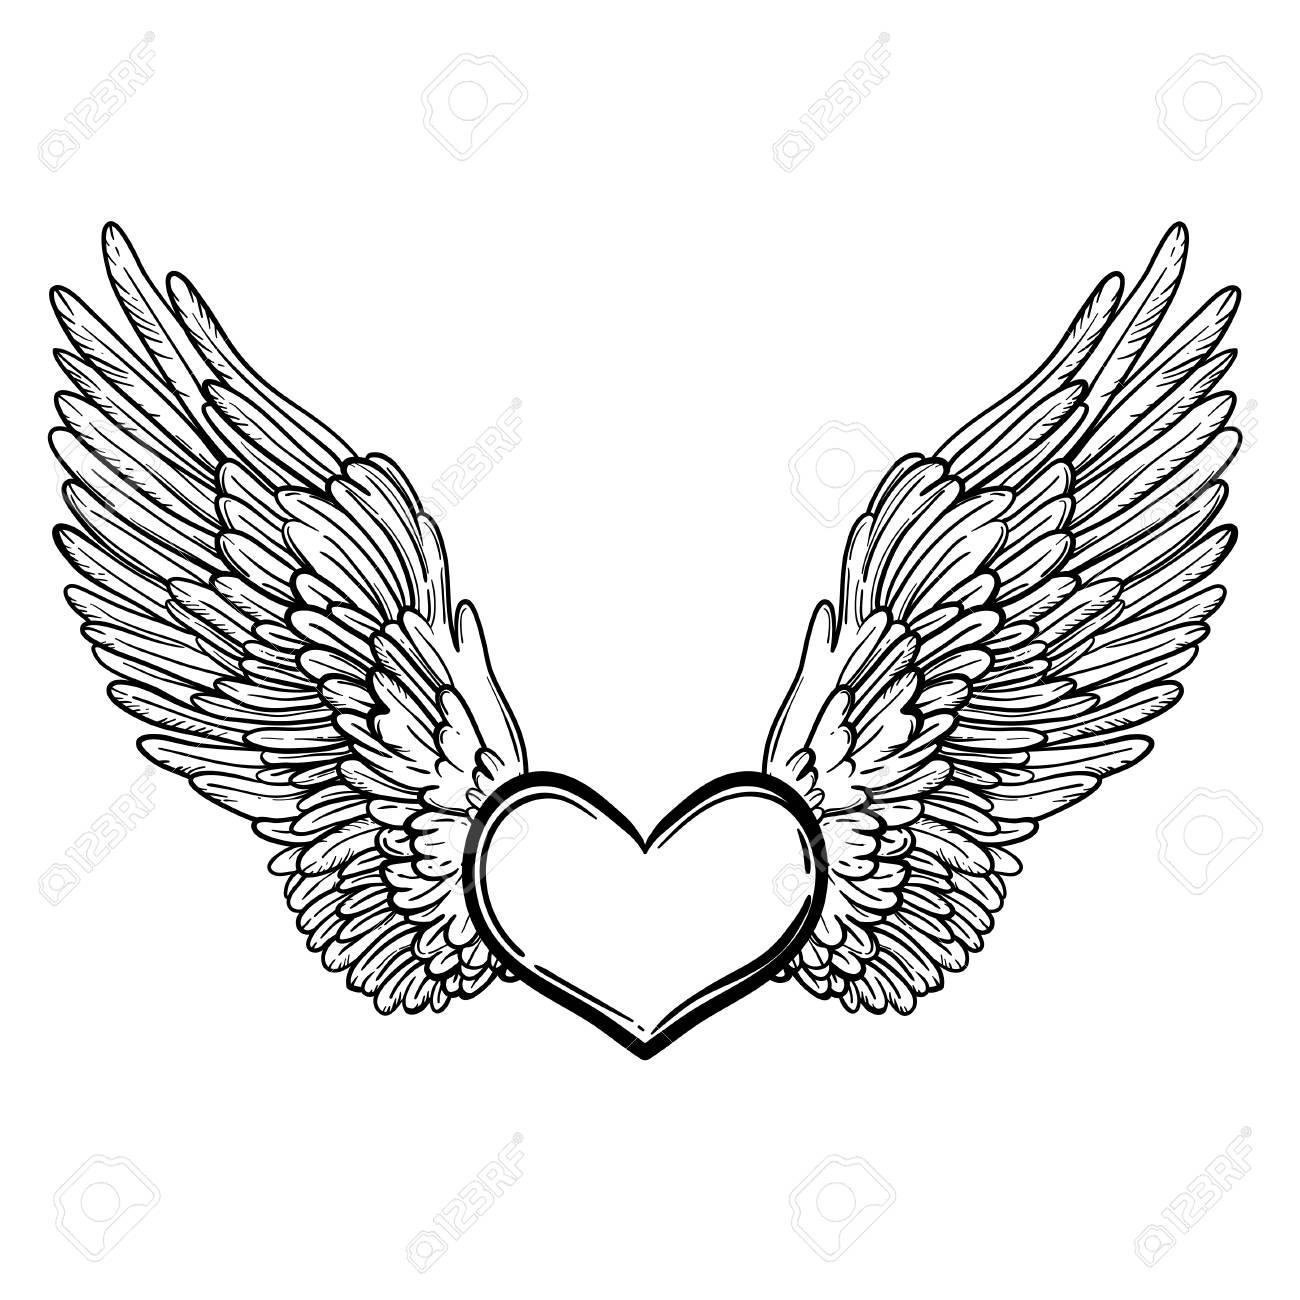 Line Art Illustration Of Angel Wings And Heart Vintage Print